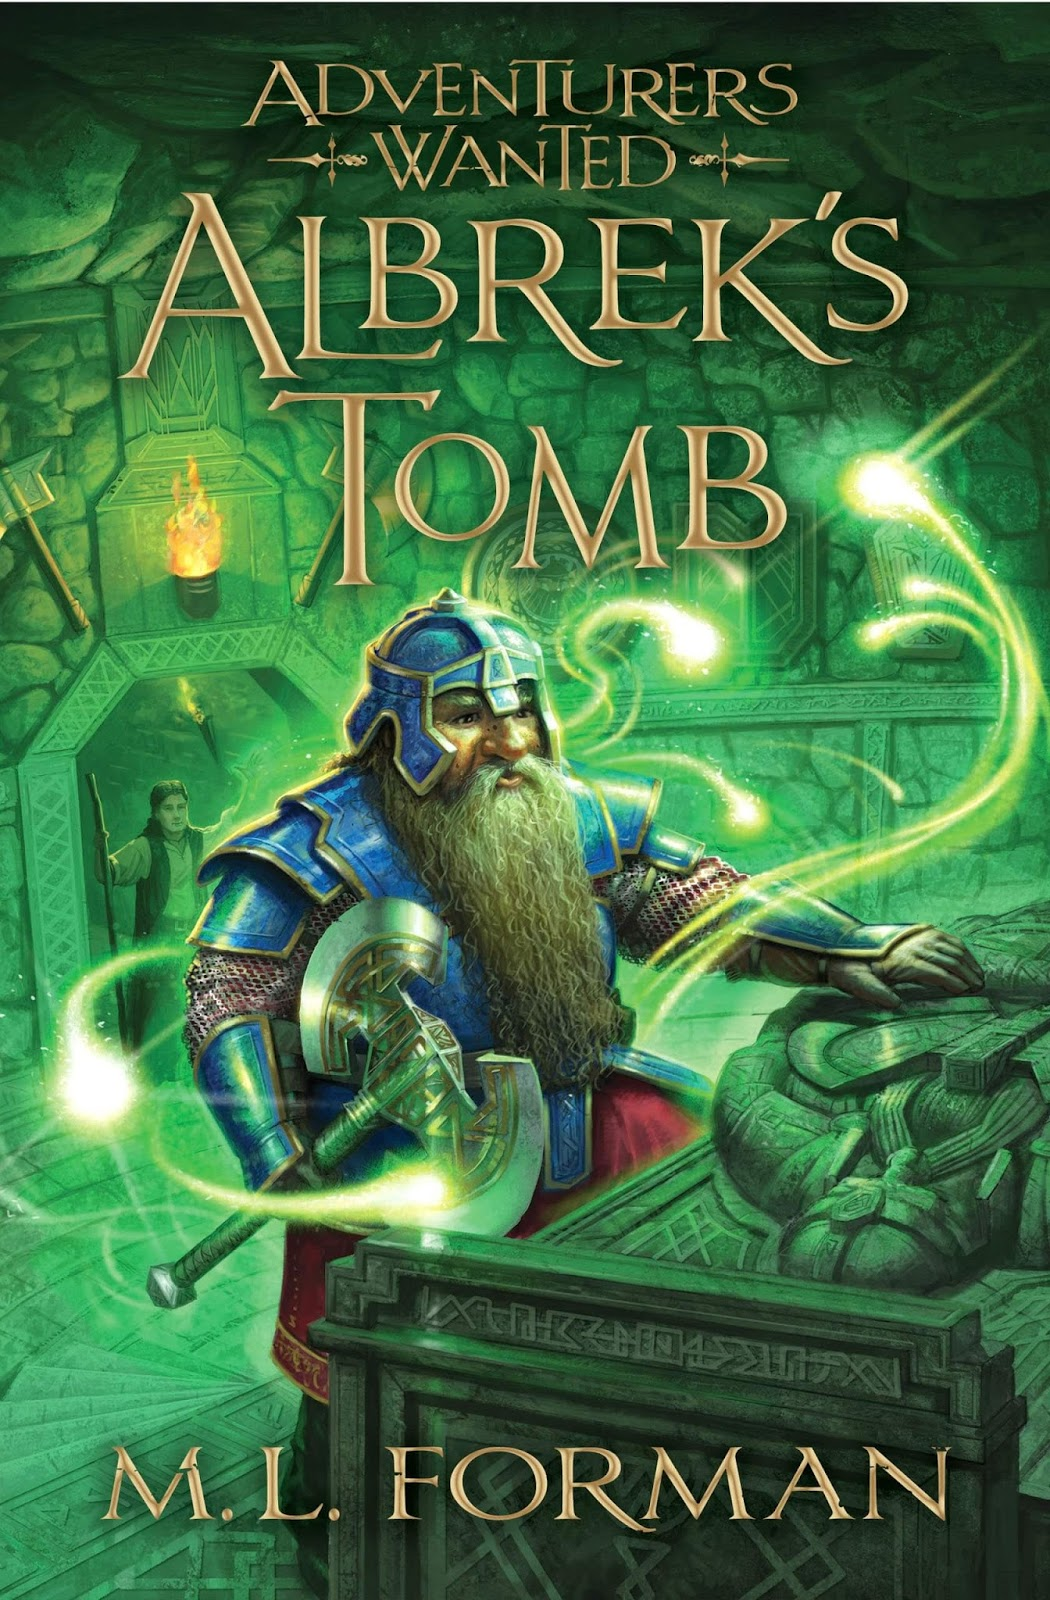 The Readathon Book Reviews Book Review Adventurers